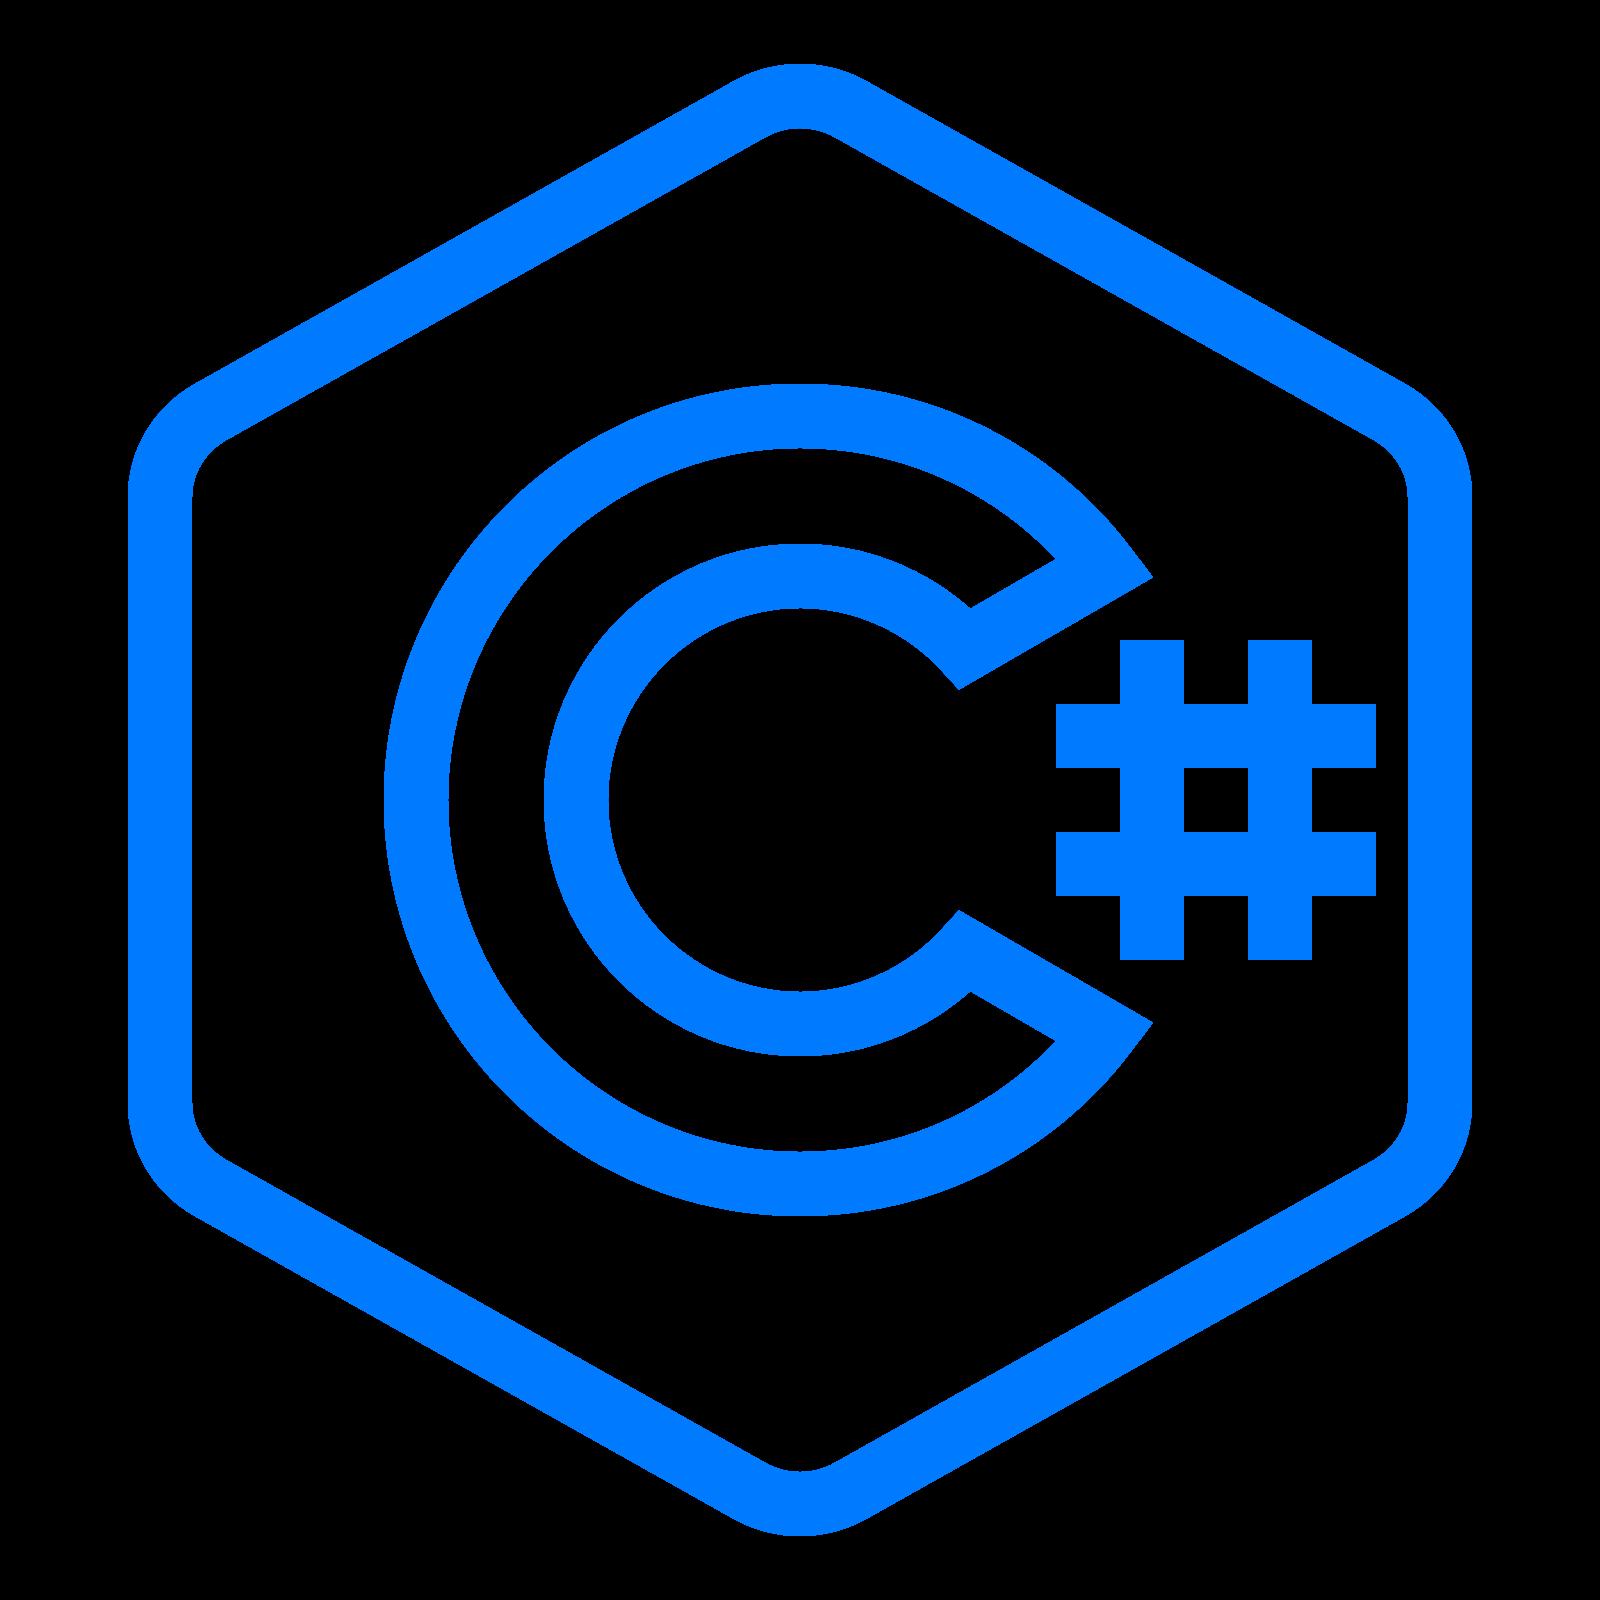 C Sharp Logo Icon.